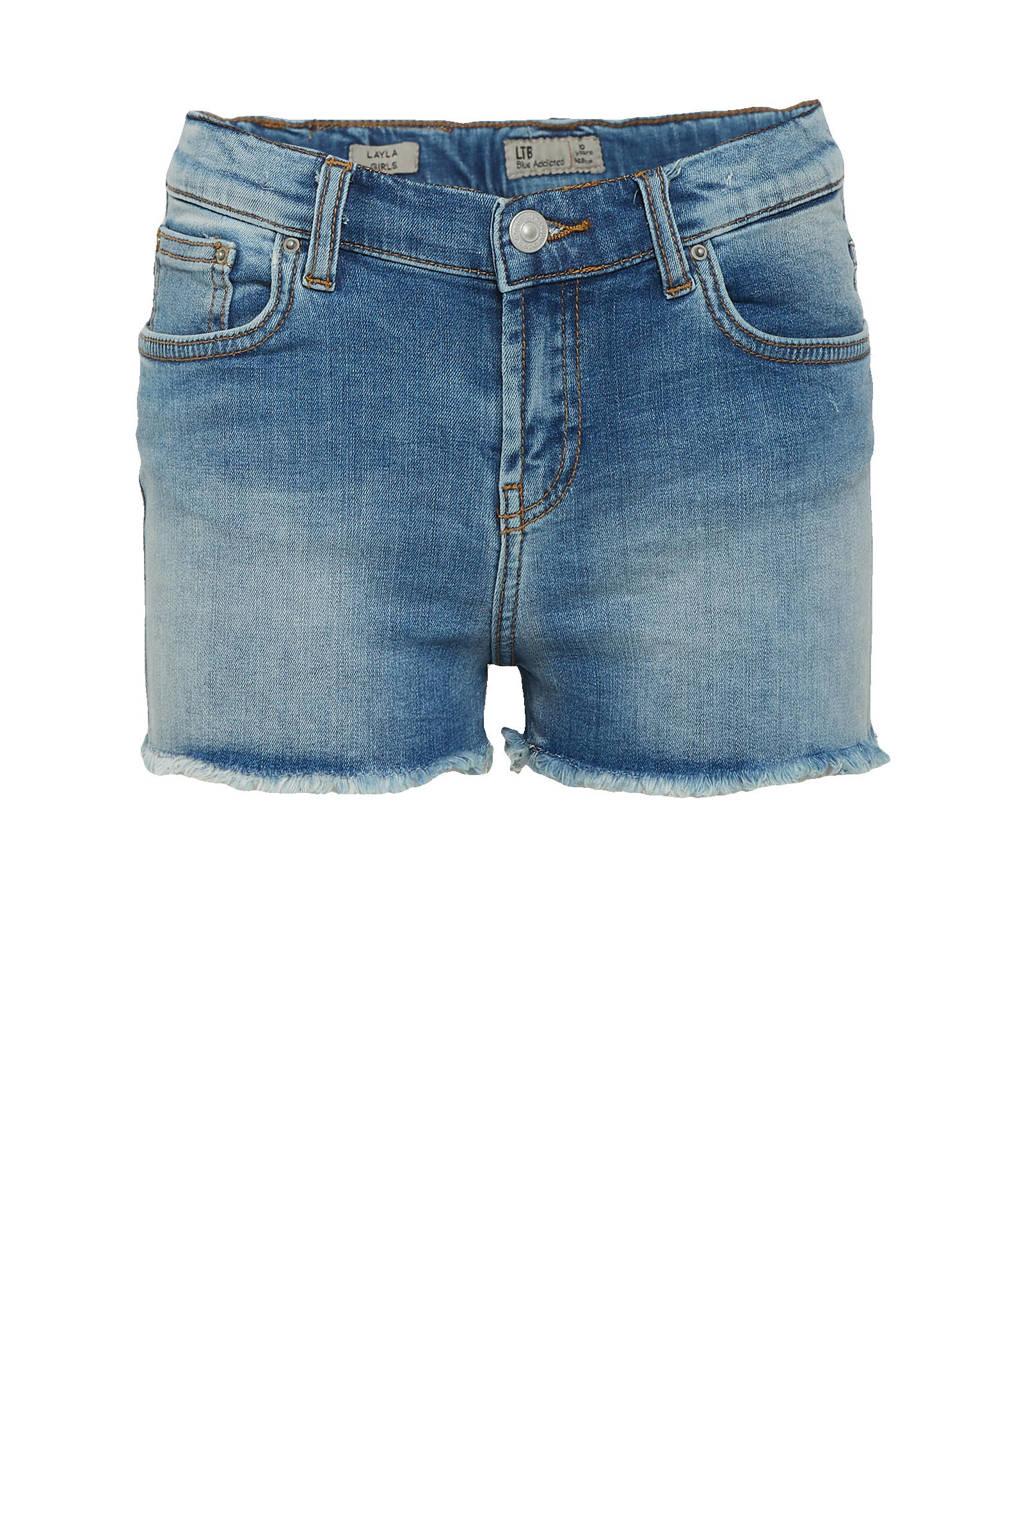 LTB high waist slim fit jeans short Layla oleana undamaged wash, Oleana undamaged wash